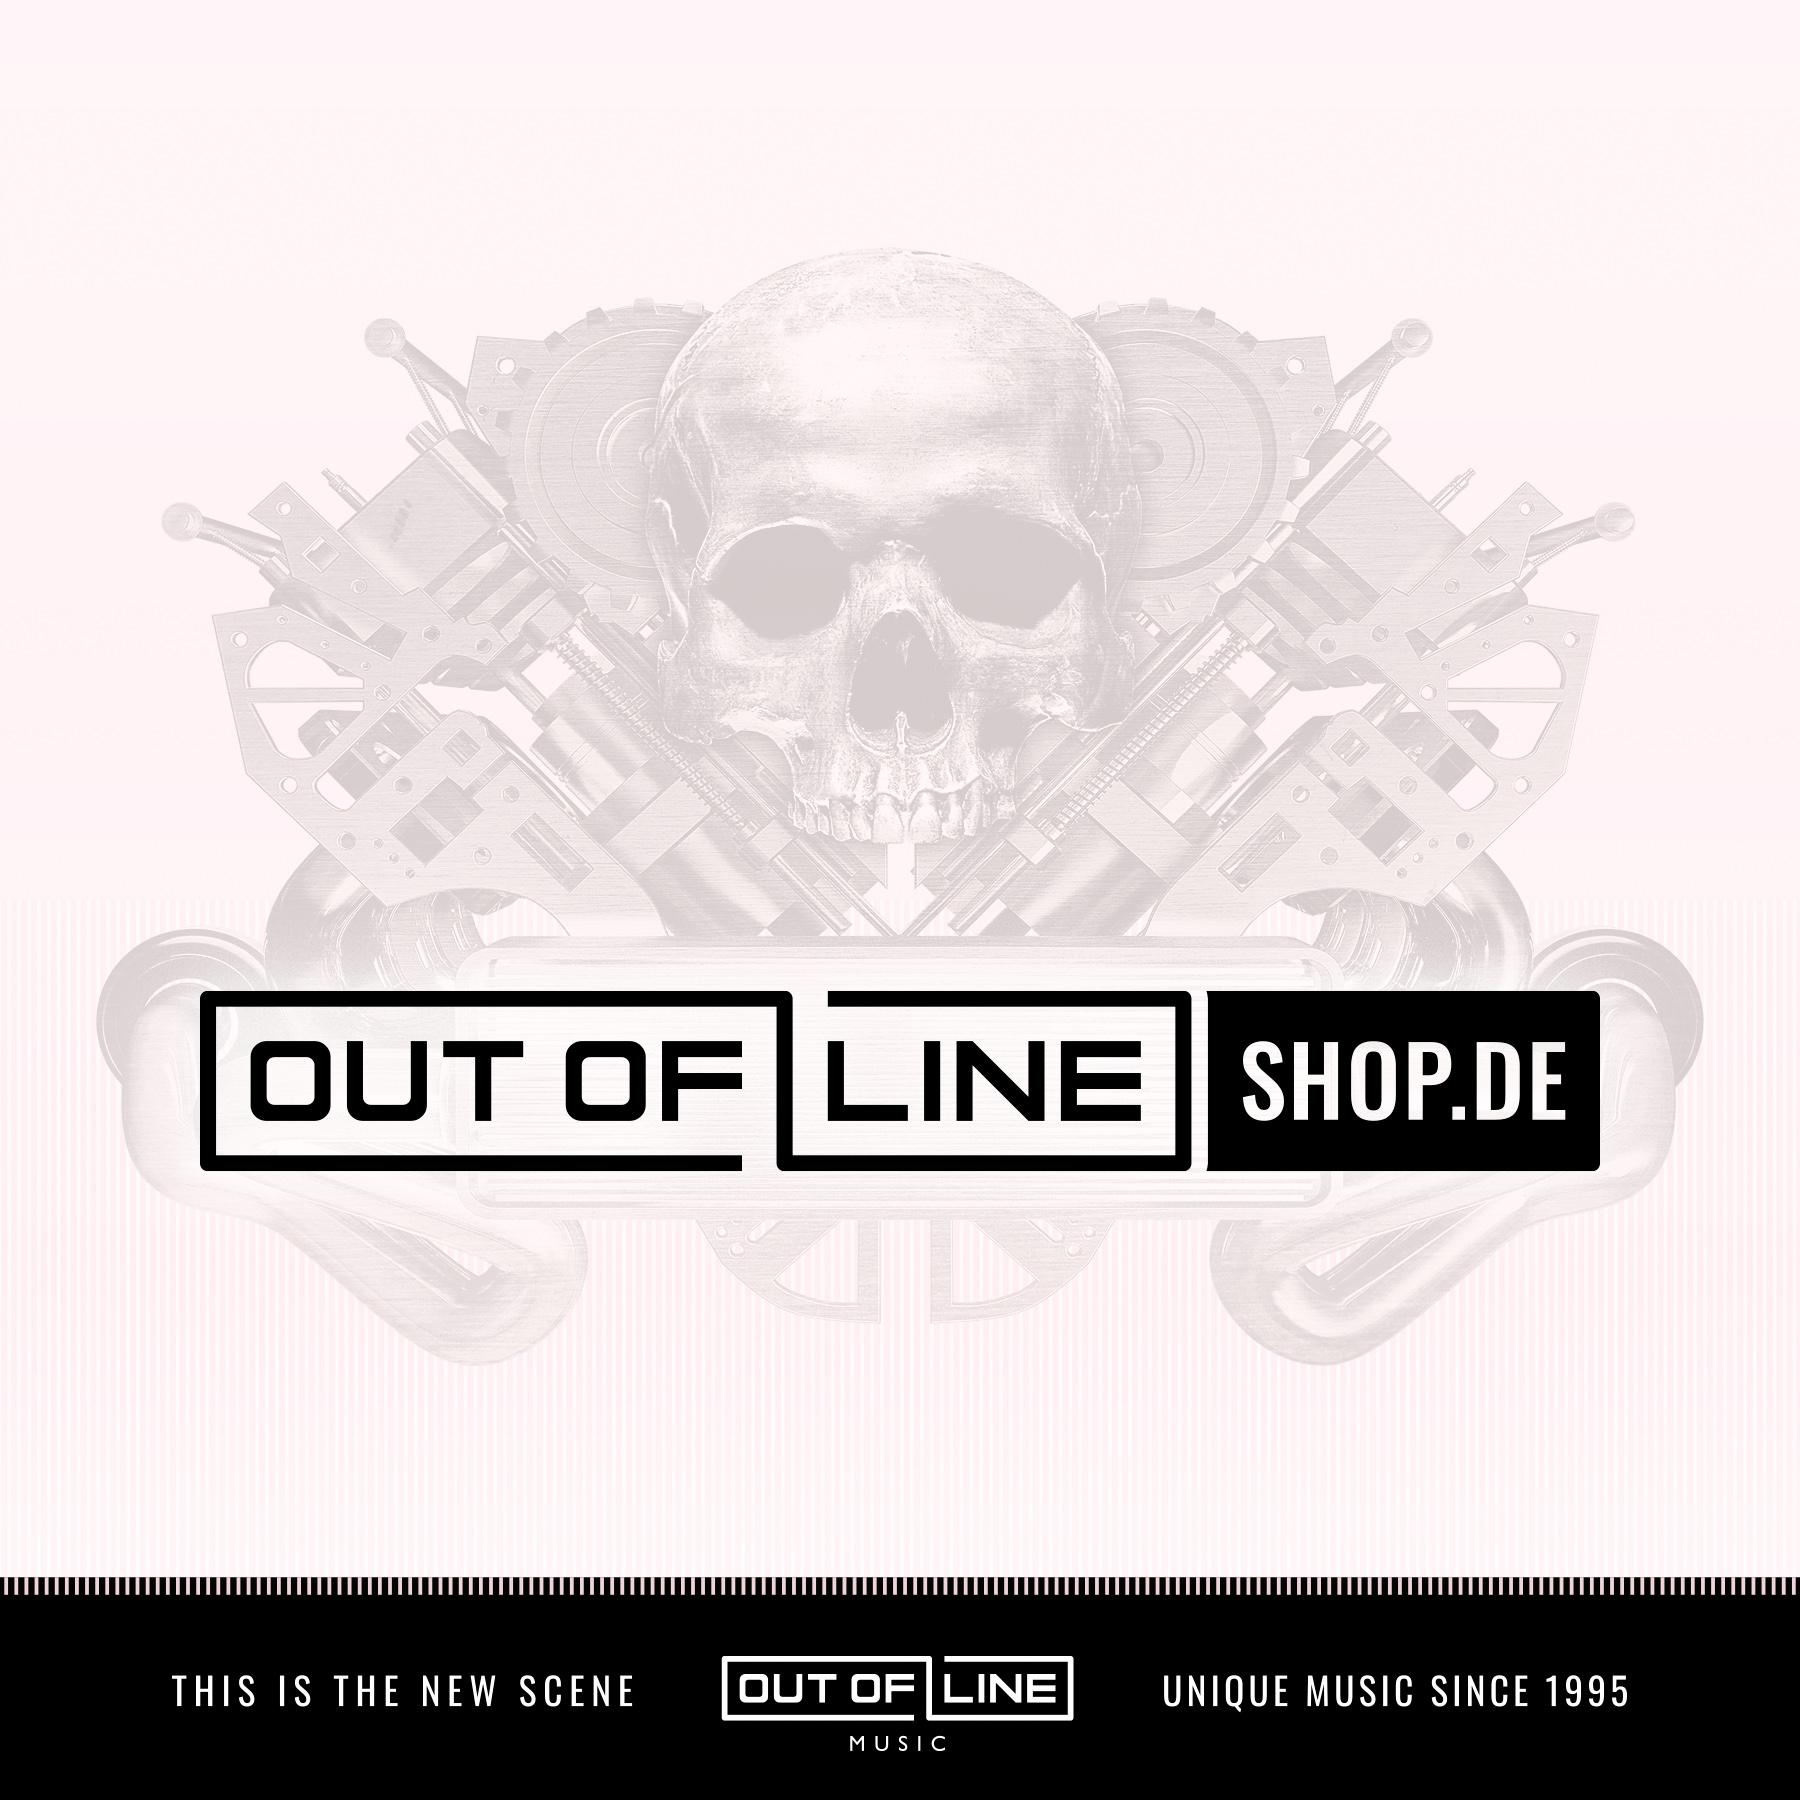 V.A. - Guitars & Machines vol. 1 - 2CD